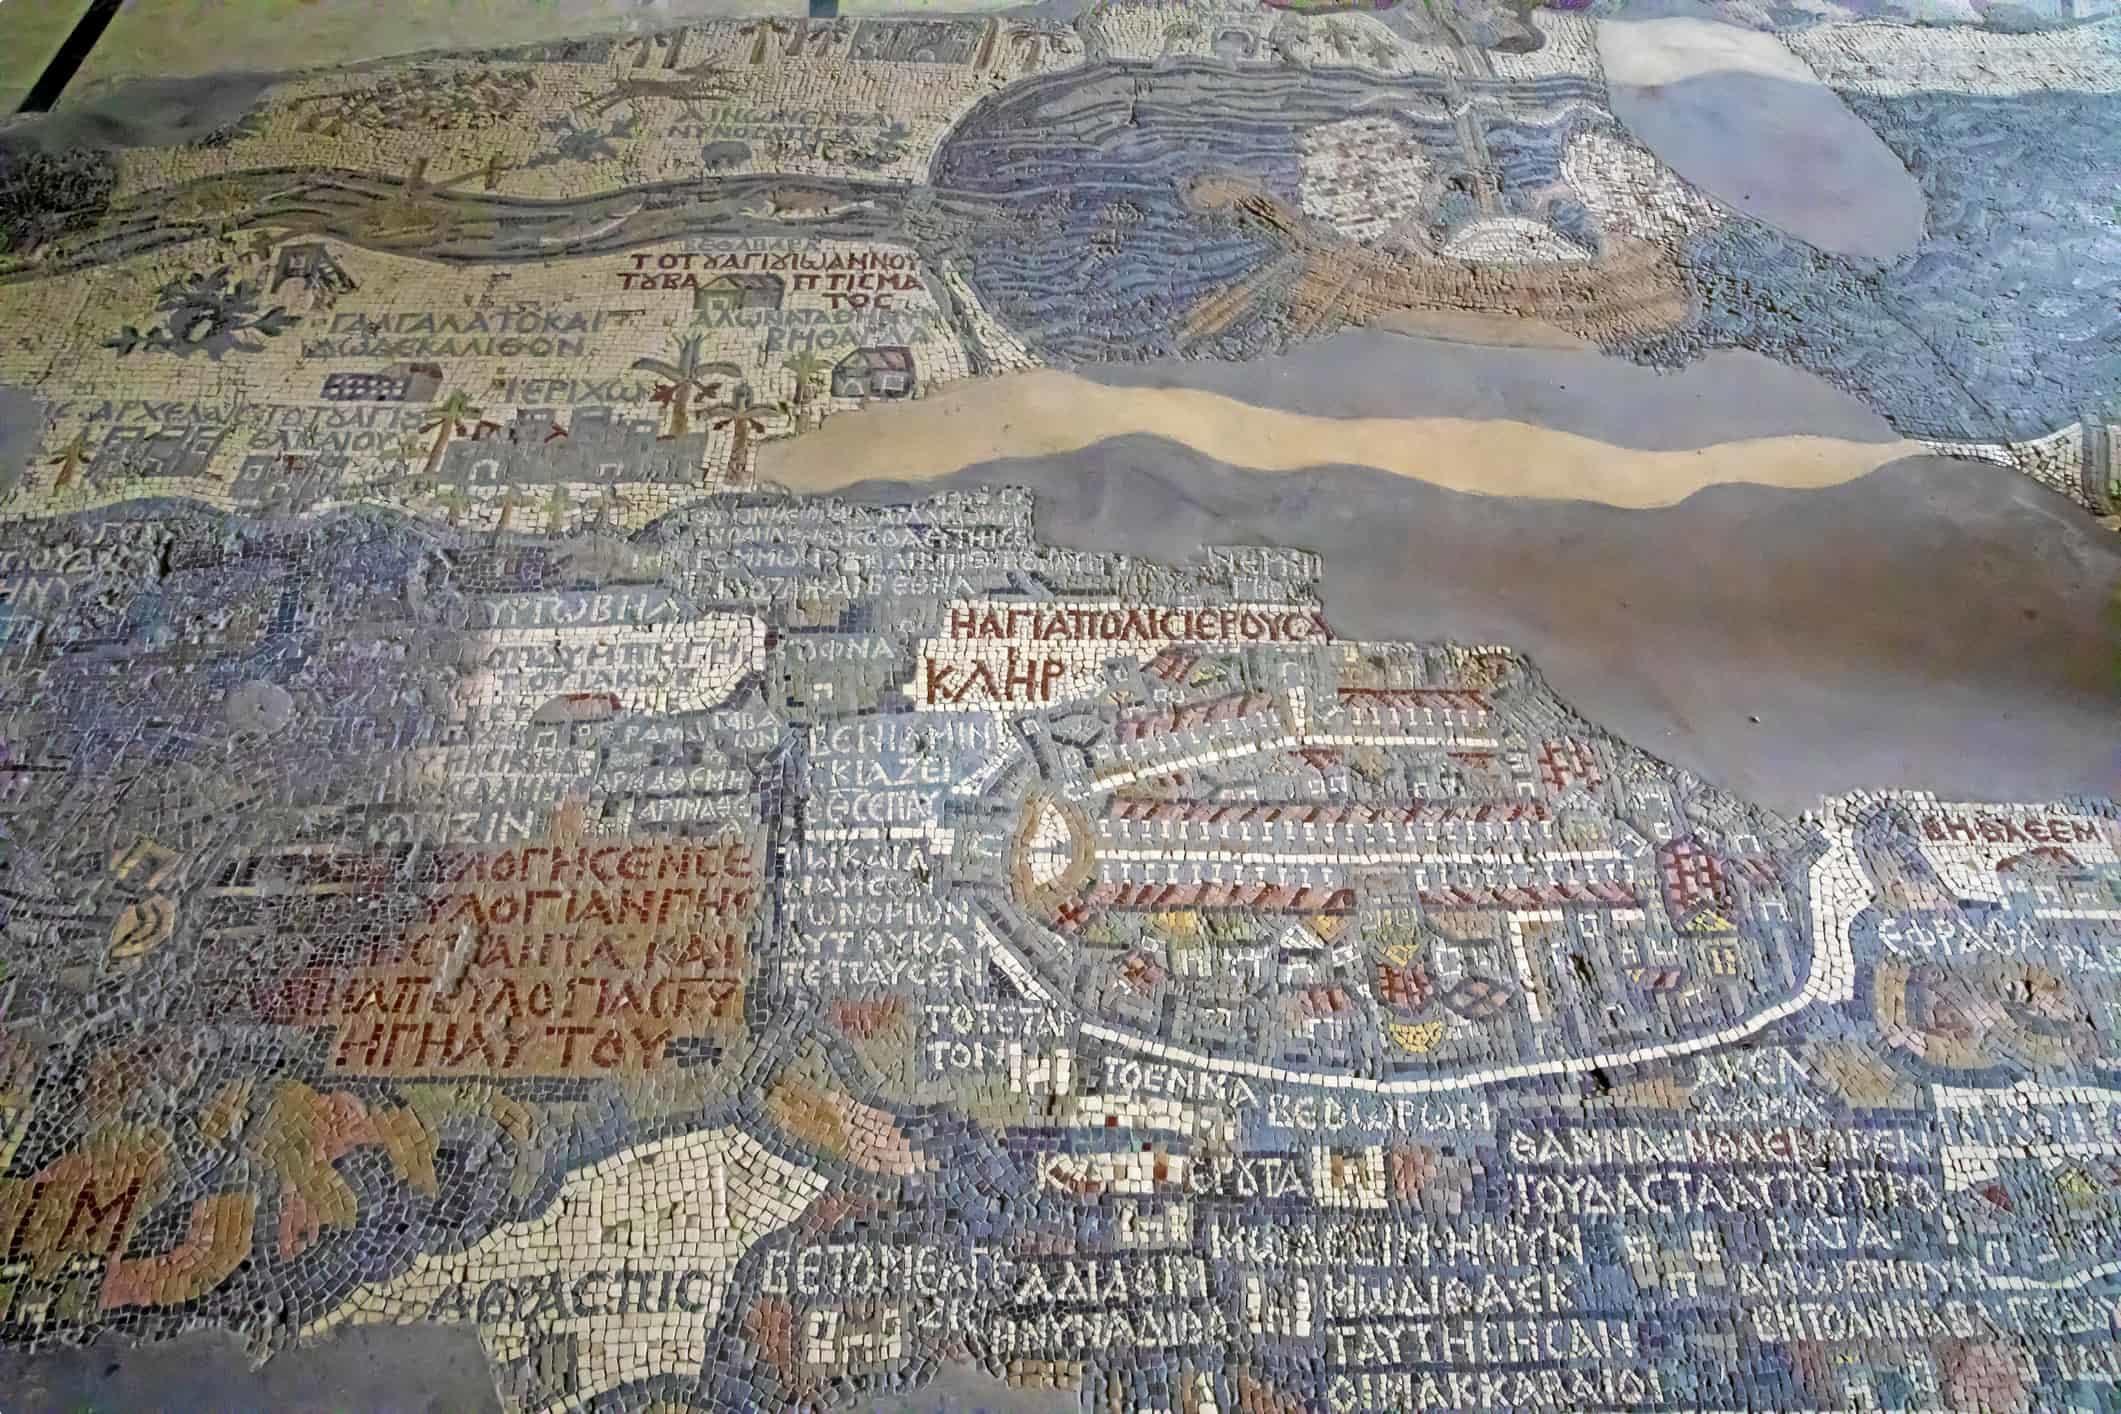 Madaba mosaic map, Madaba, Jordan